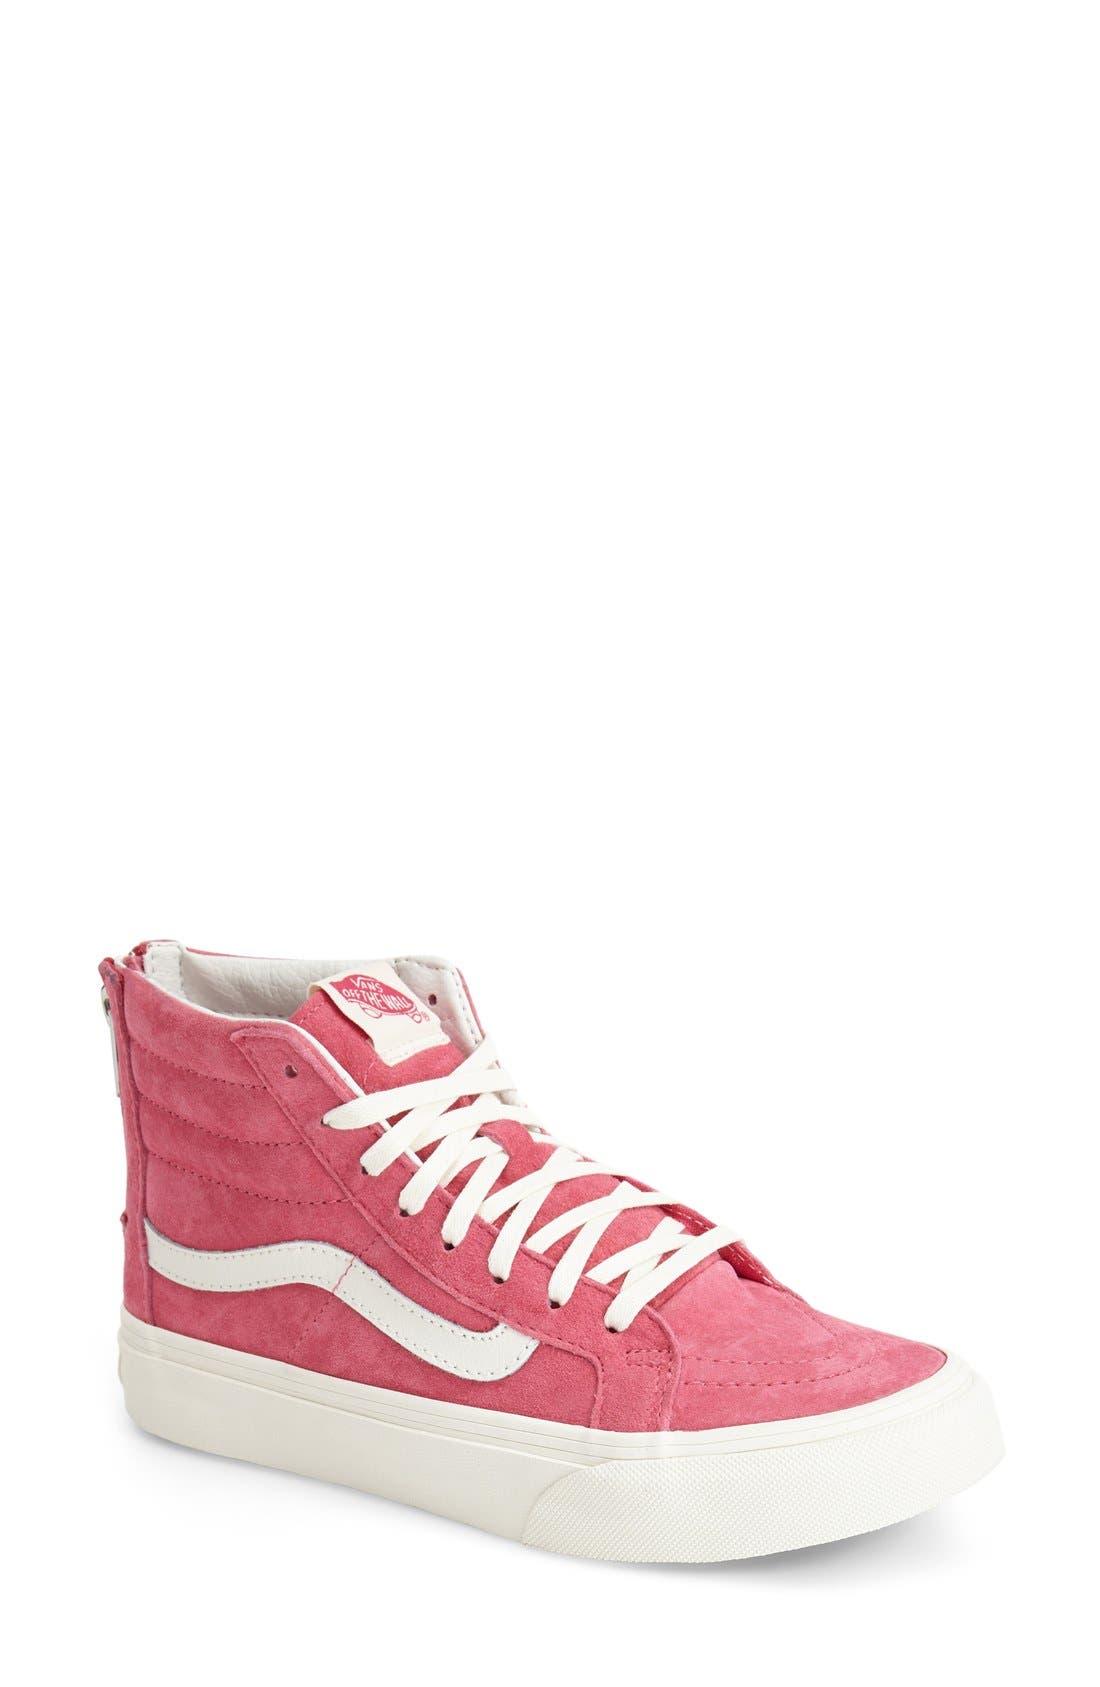 Main Image - Vans 'Sk8-Hi Slim Zip' Sneaker (Women)